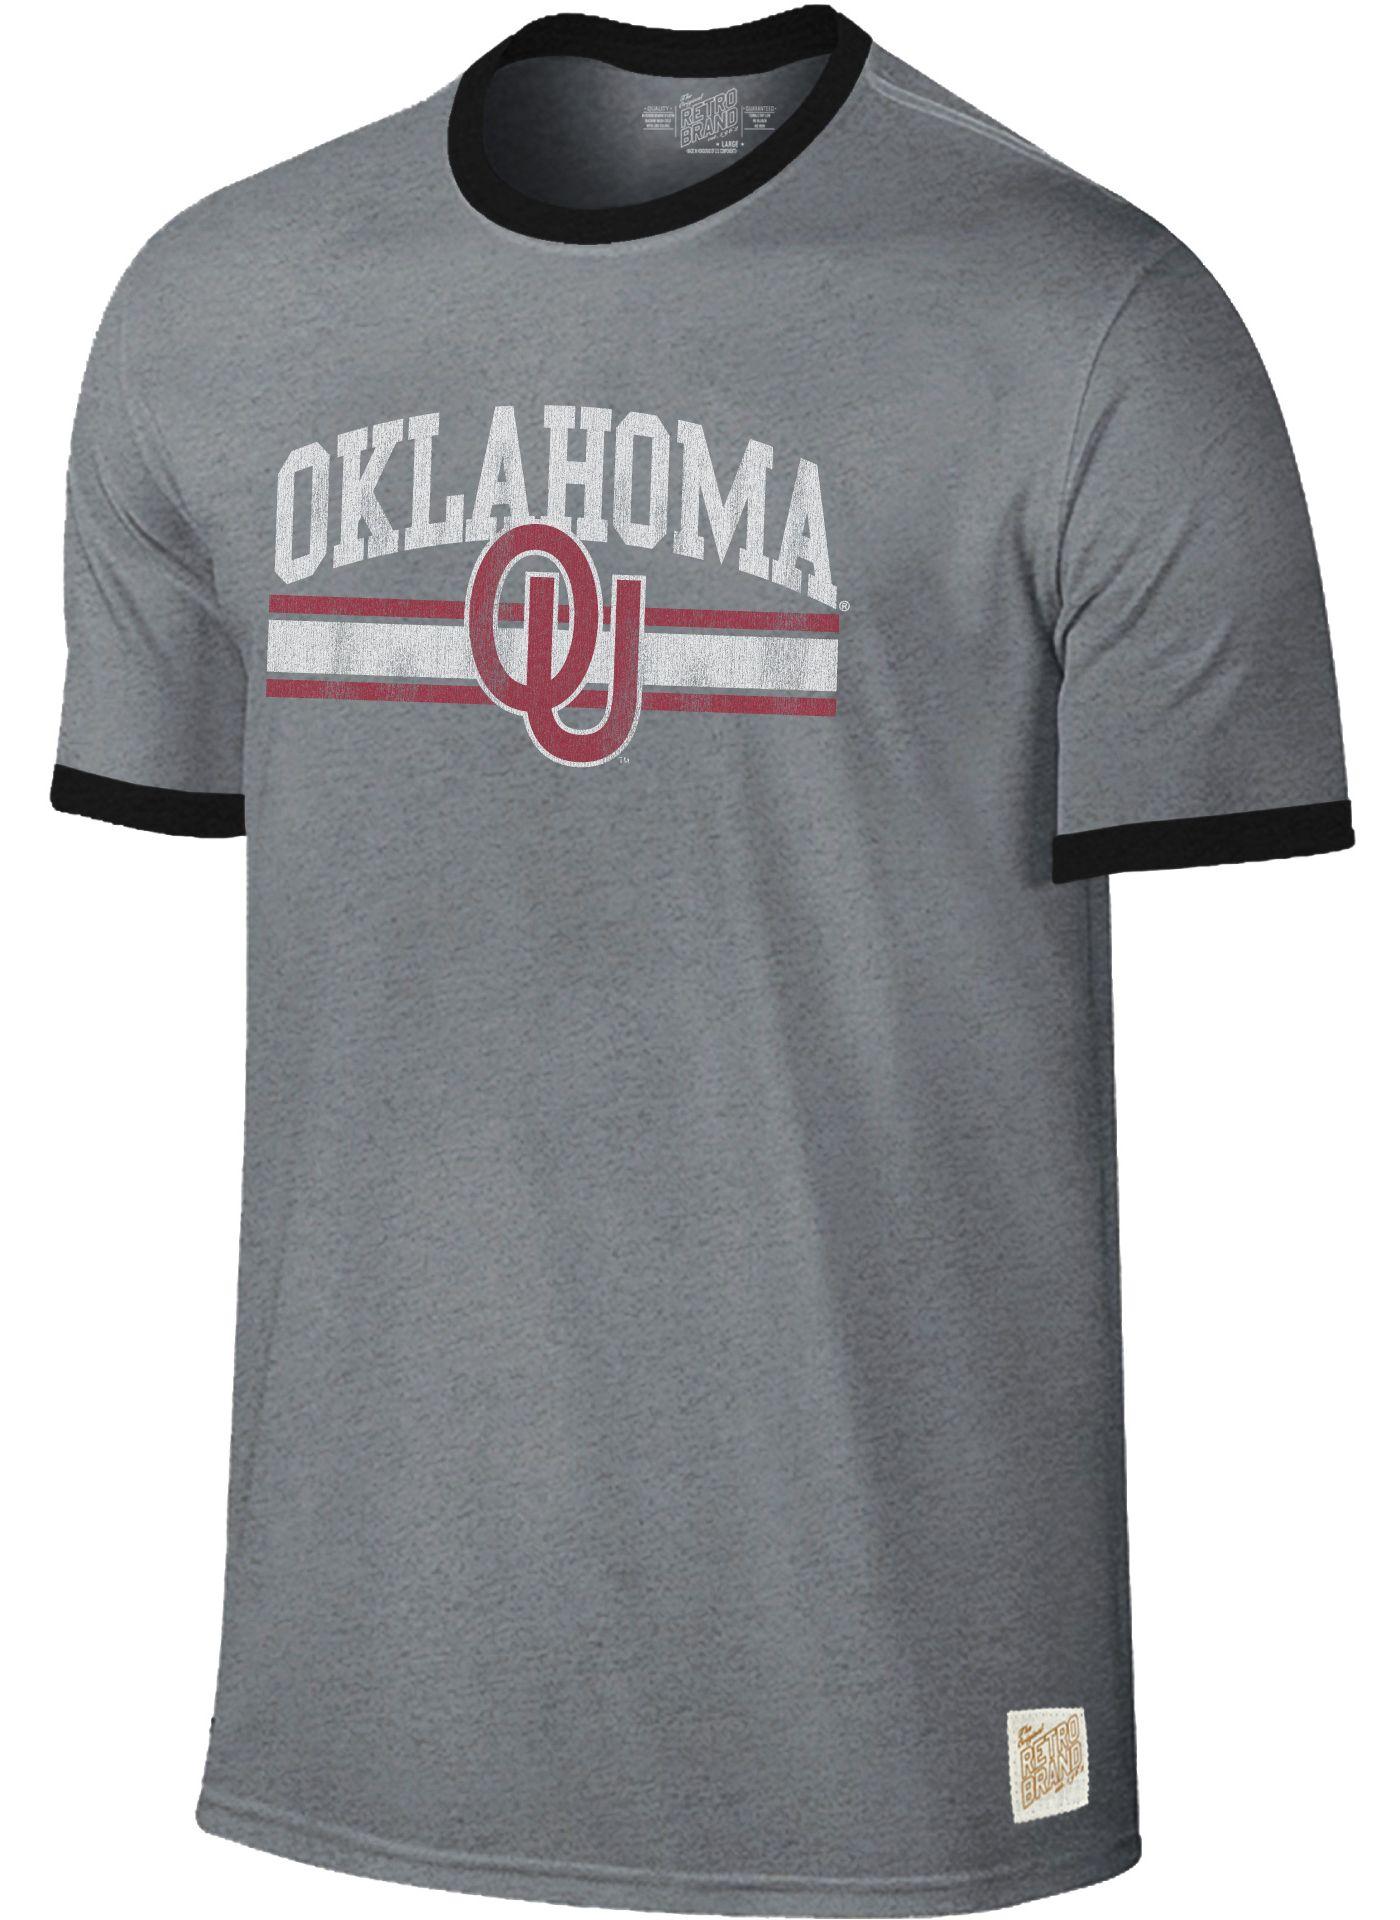 Original Retro Brand Men's Oklahoma Sooners Grey Ringer T-Shirt